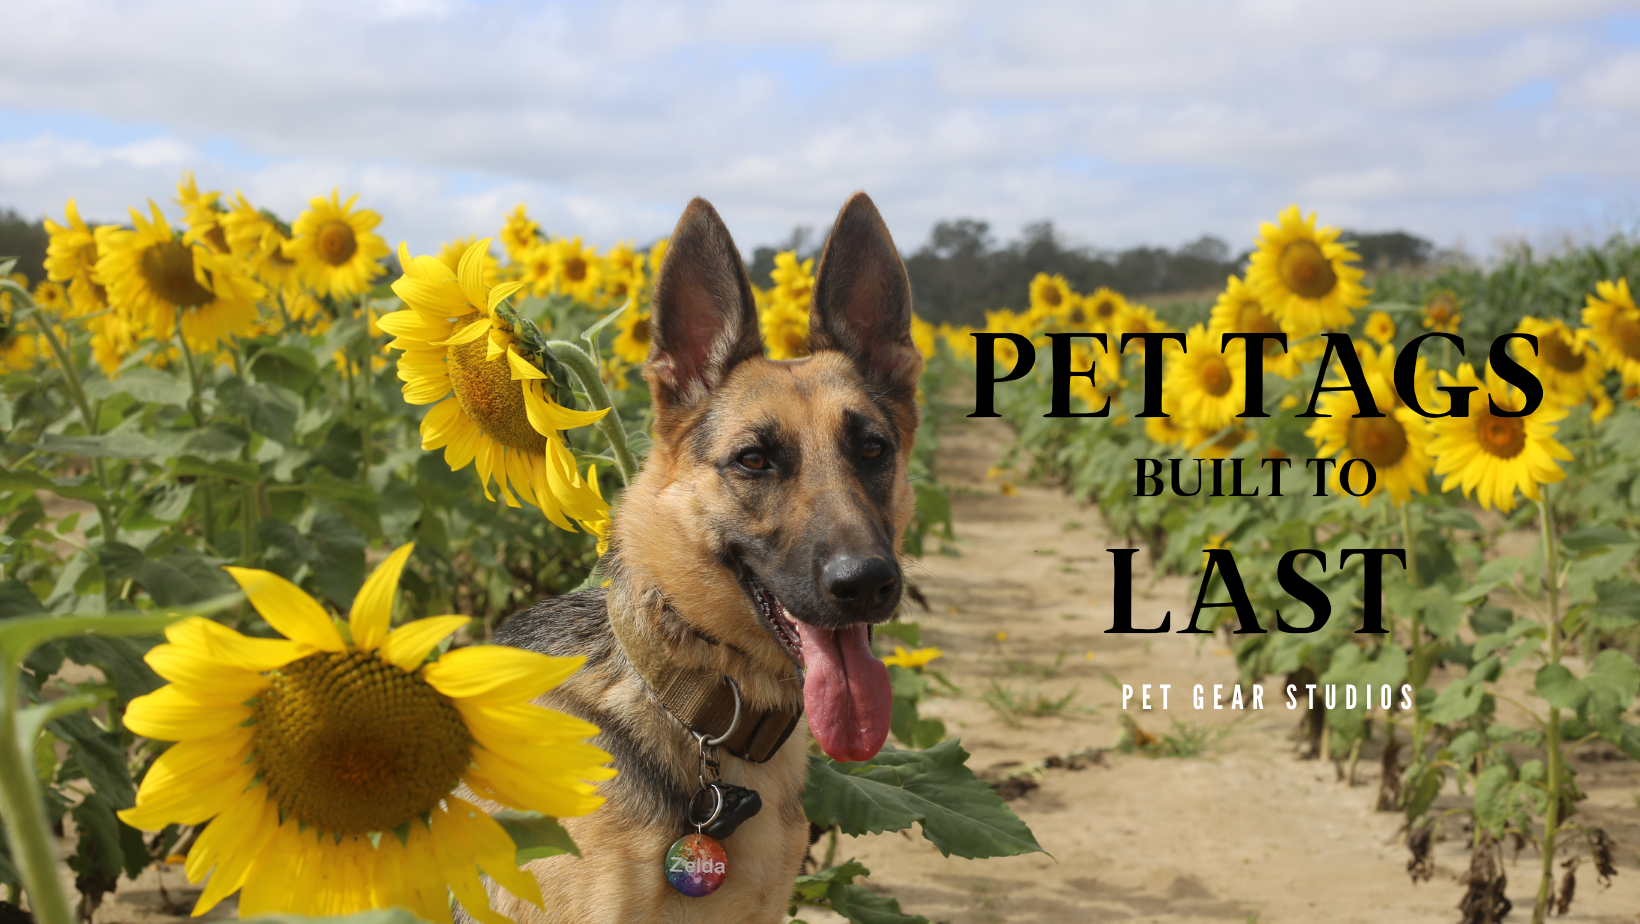 Pet Gear Studios - Pet Tags - Dog Tags